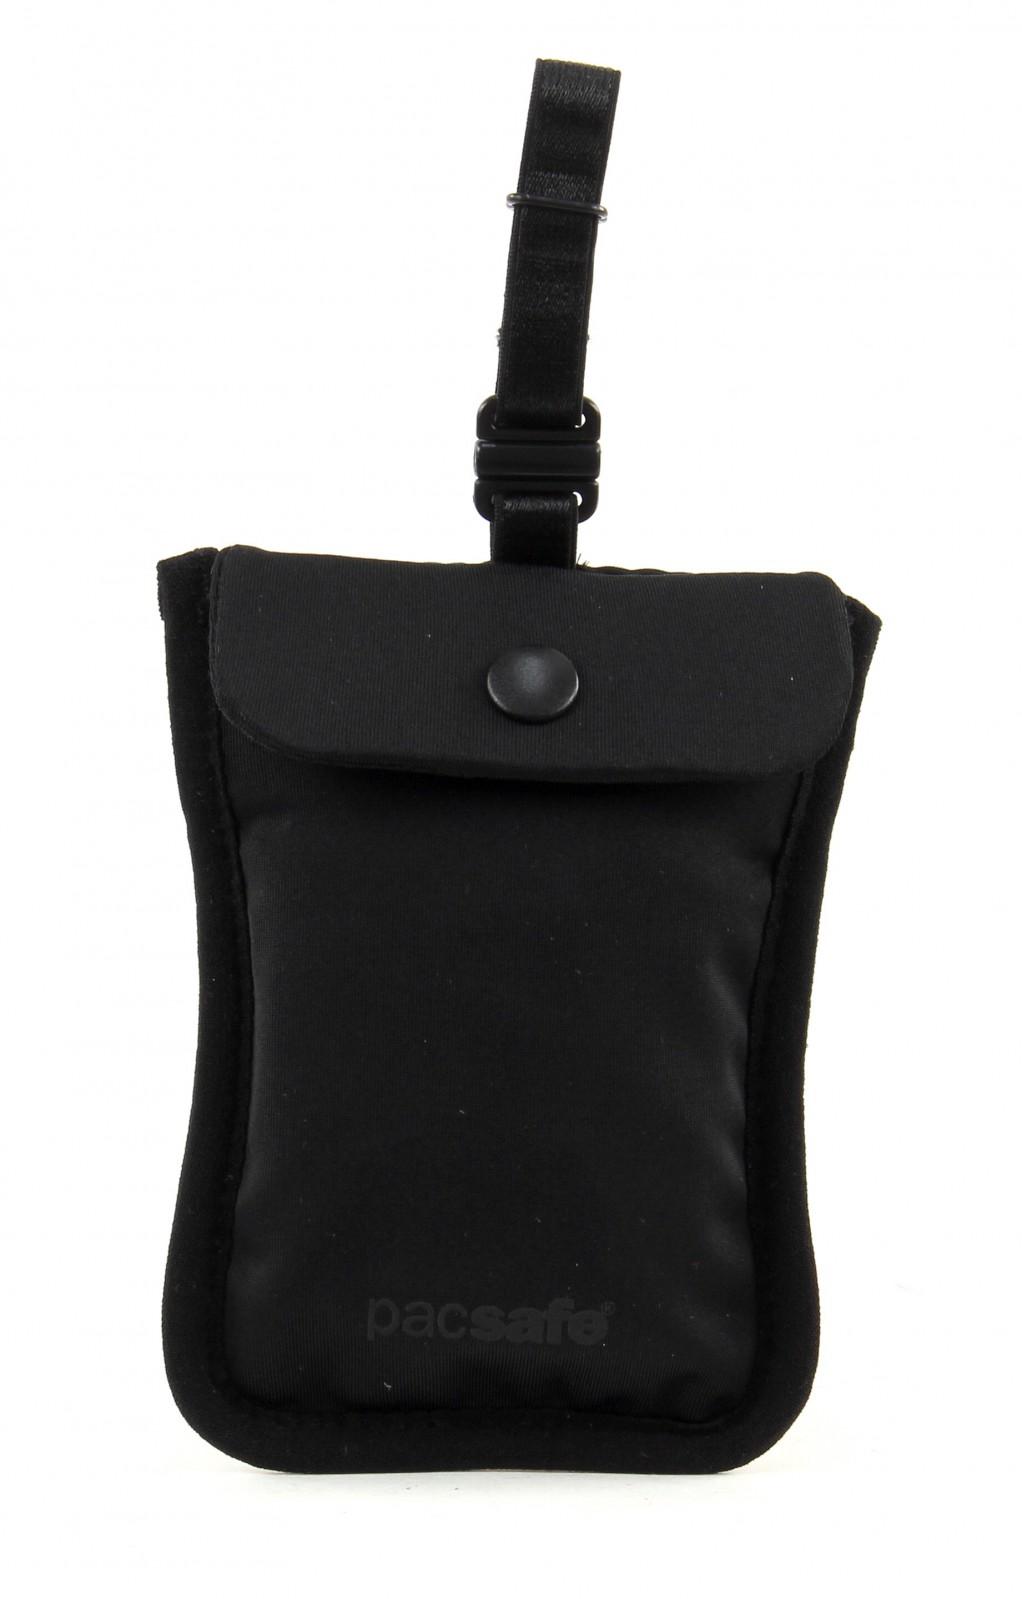 pacsafe Coversafe S25 Secret Bra Pouch Black